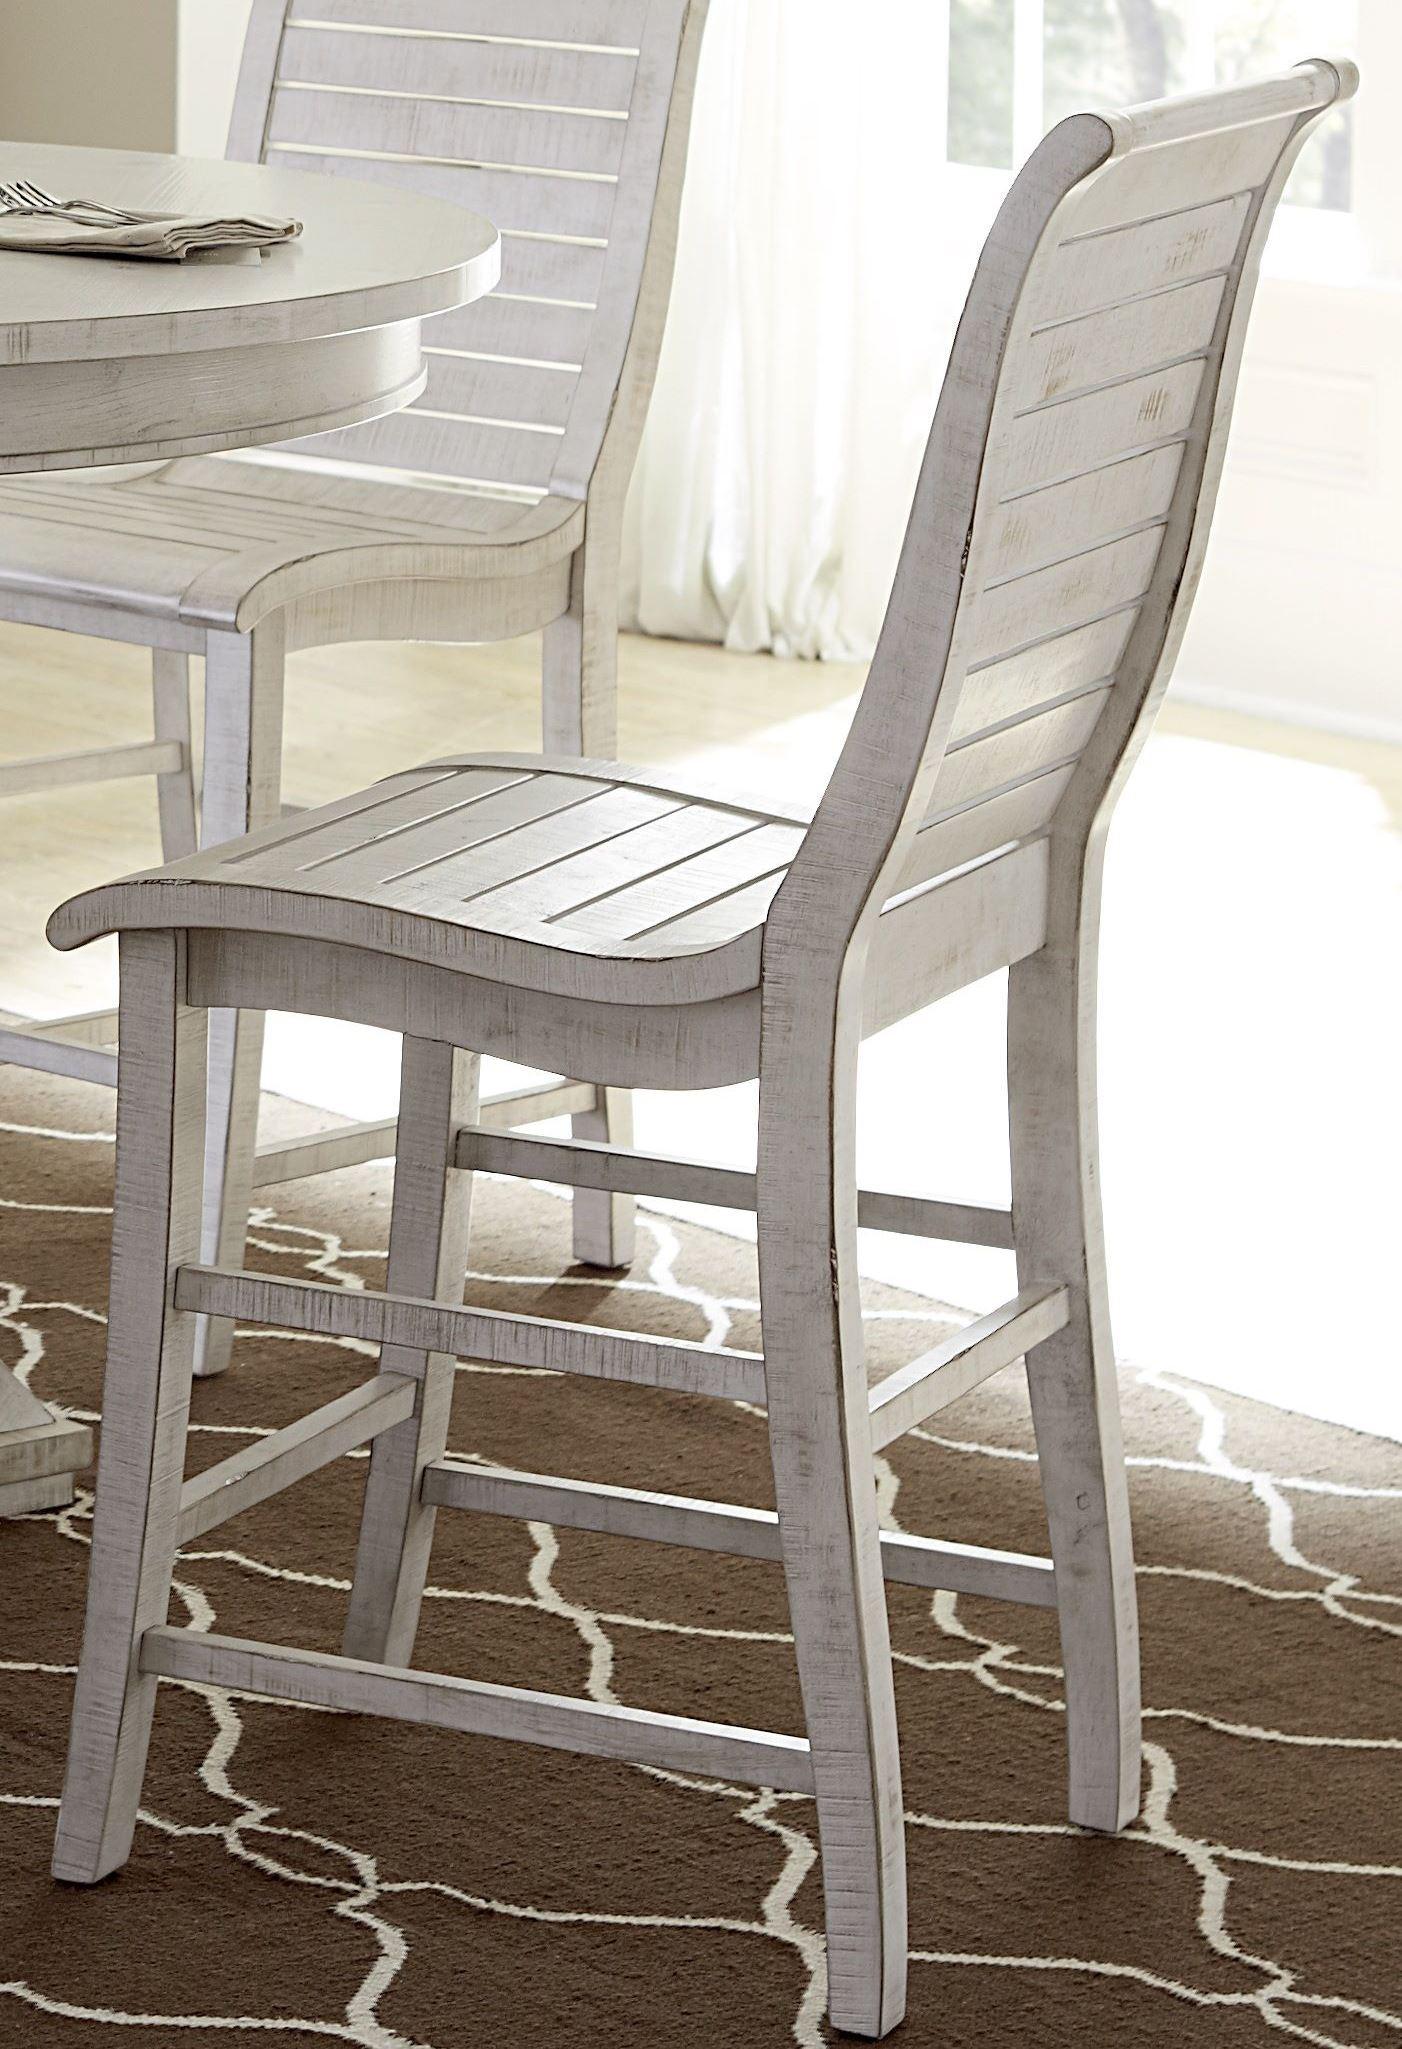 Willow Distressed White Slat Bedroom Set: Willow Distressed White Counter Chair Set Of 2 From